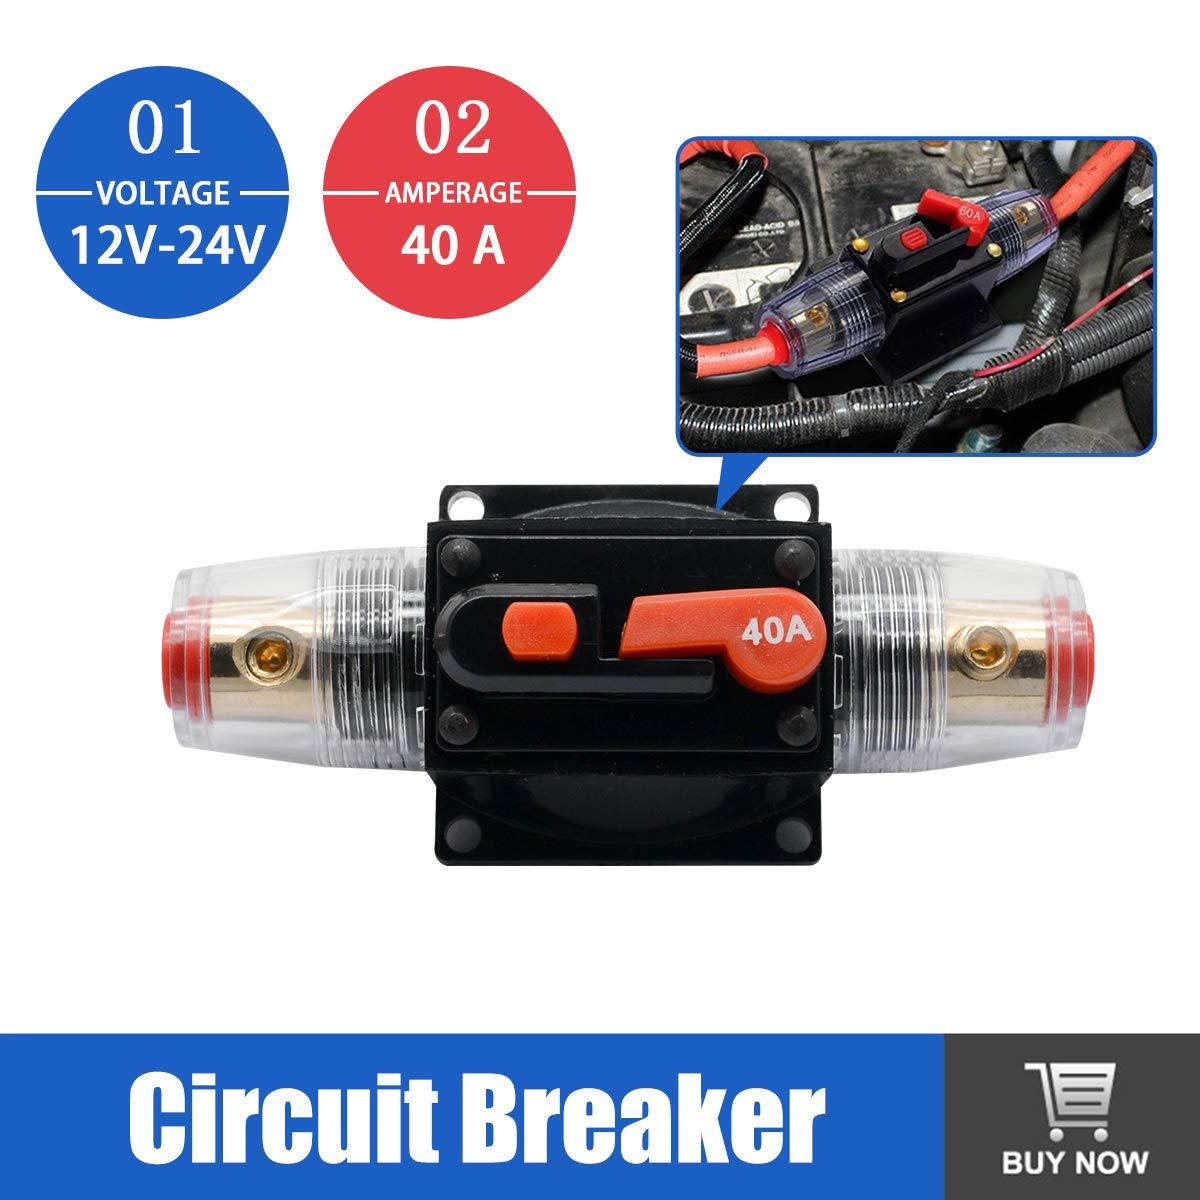 MASO 12V-24V DC Car Audio Inline Circuit Breaker Fuse Block for Auto Motor Car Marine Boat Audio Solar Inverter System Protection 40 Amp Circuit Breaker with Manual Reset